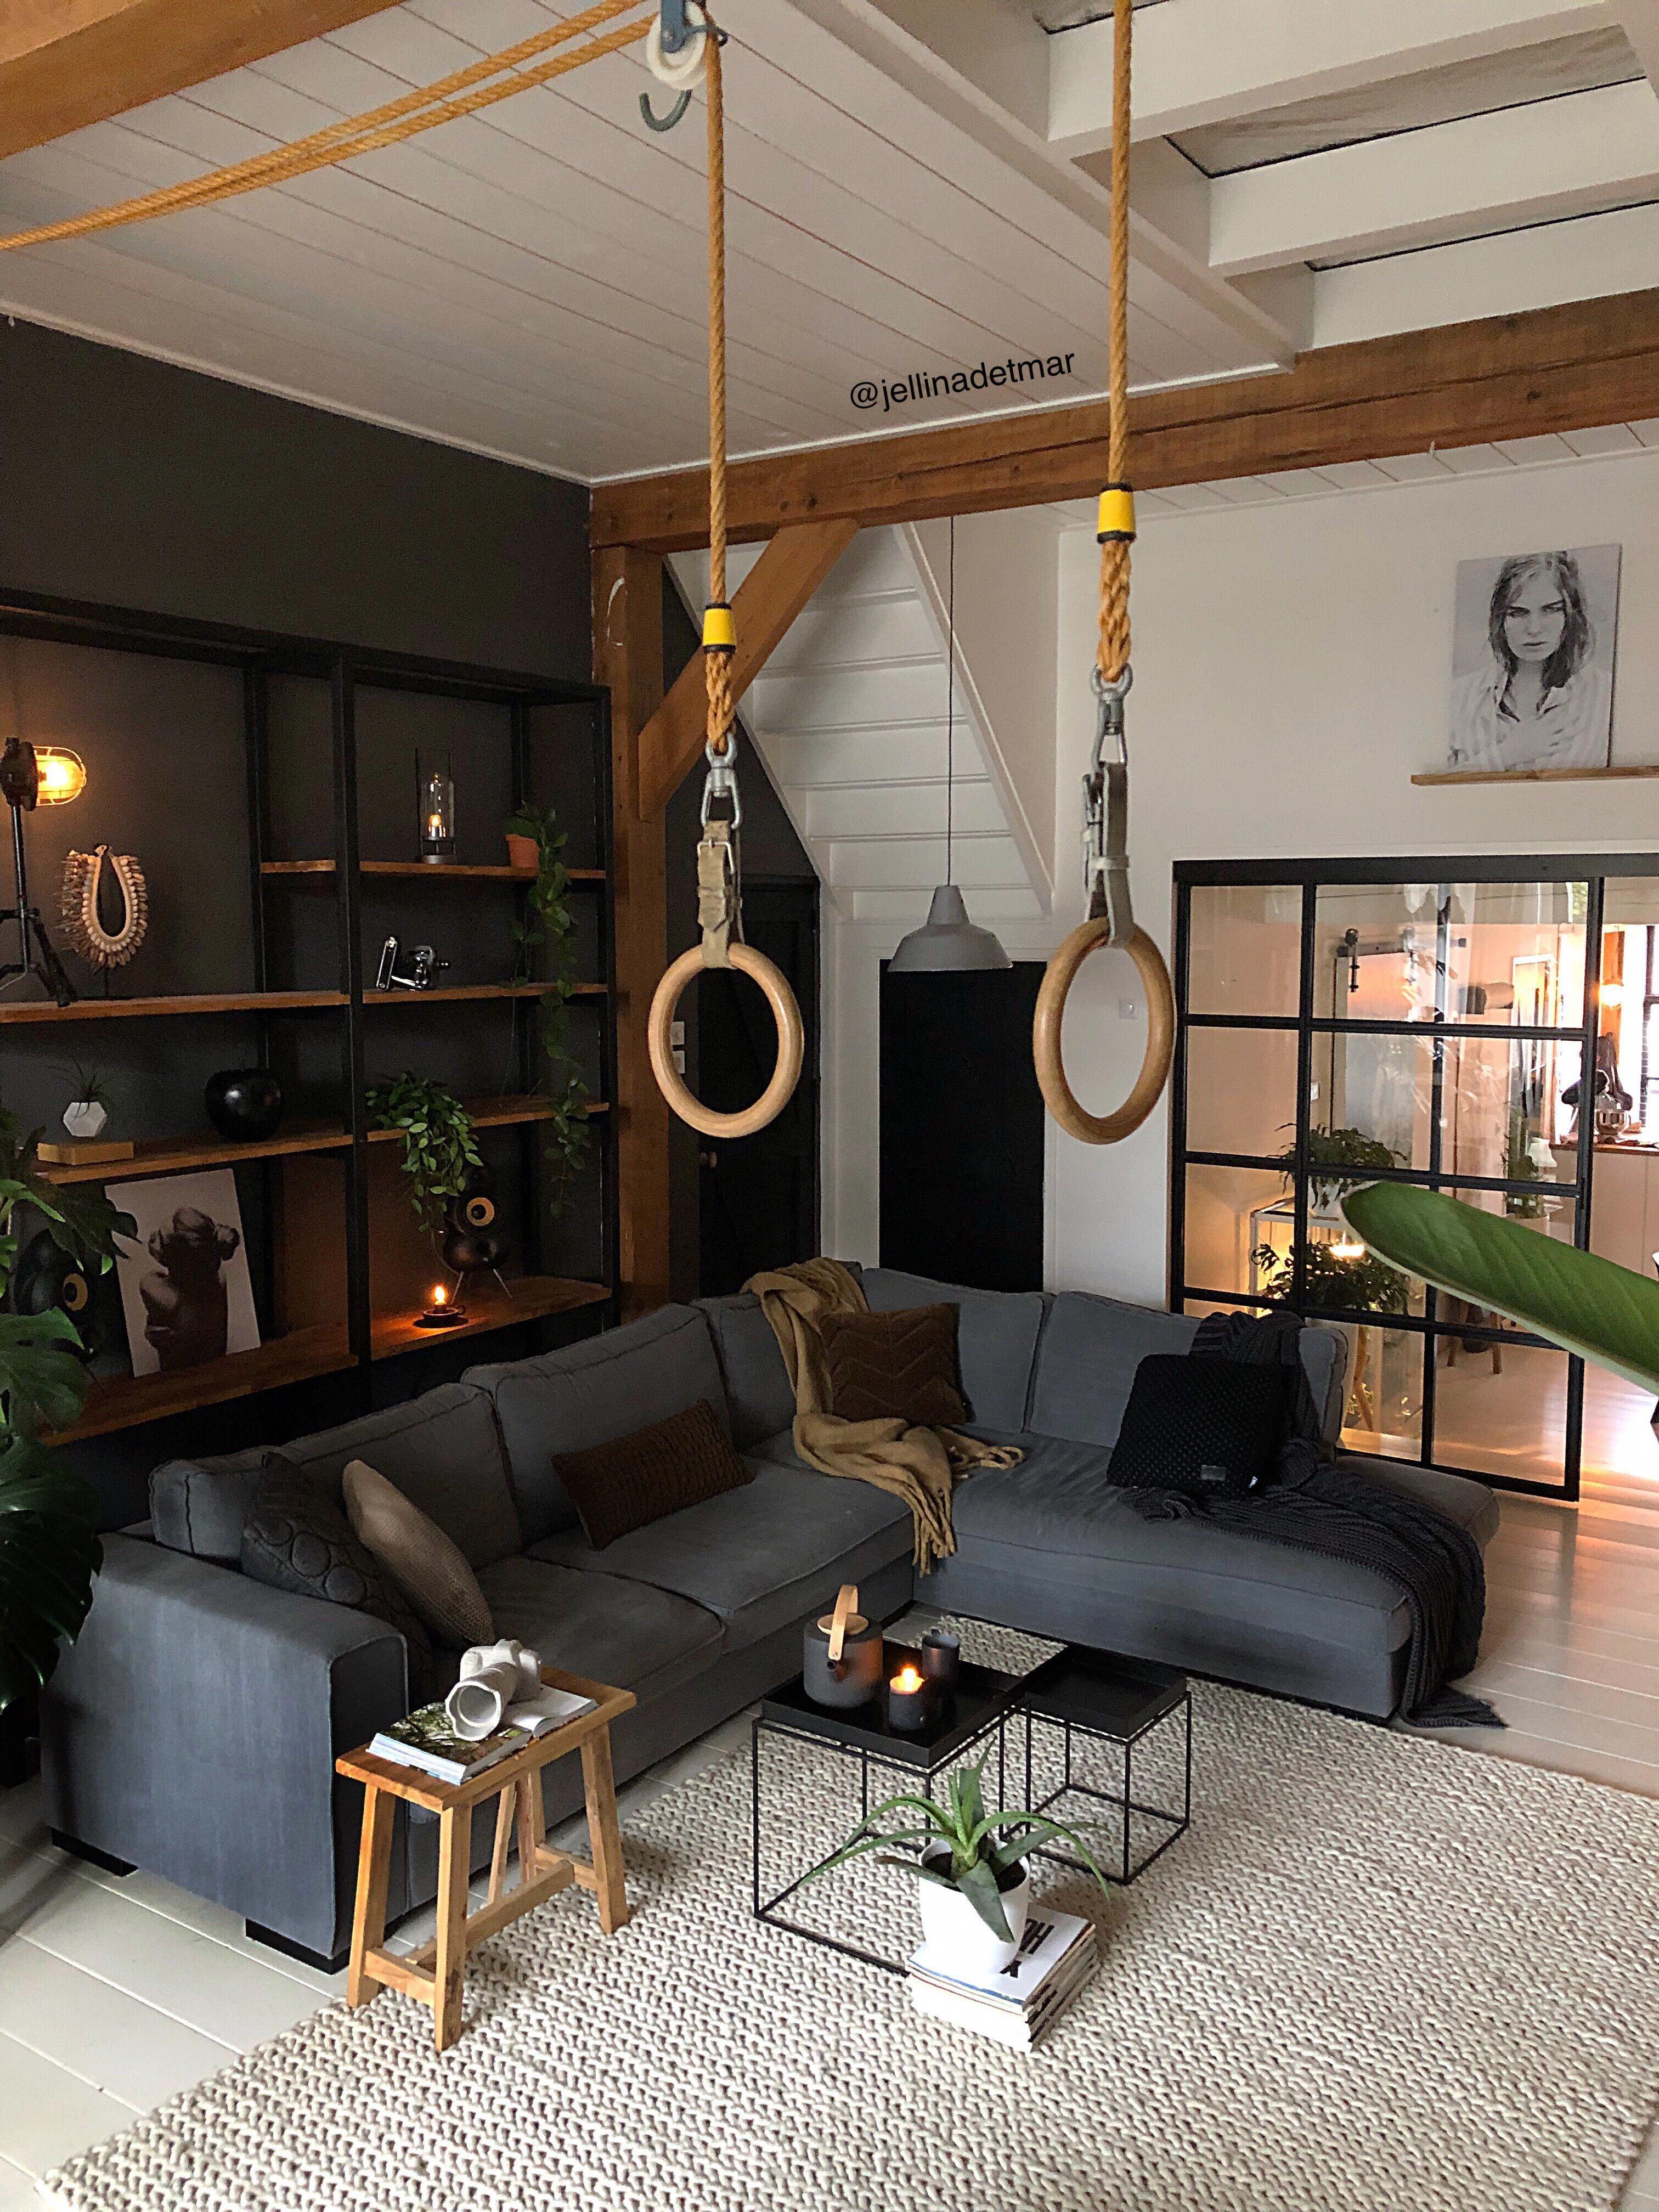 Vintage Industrial Farmhouse Vintageindustrial Cozy Living Room